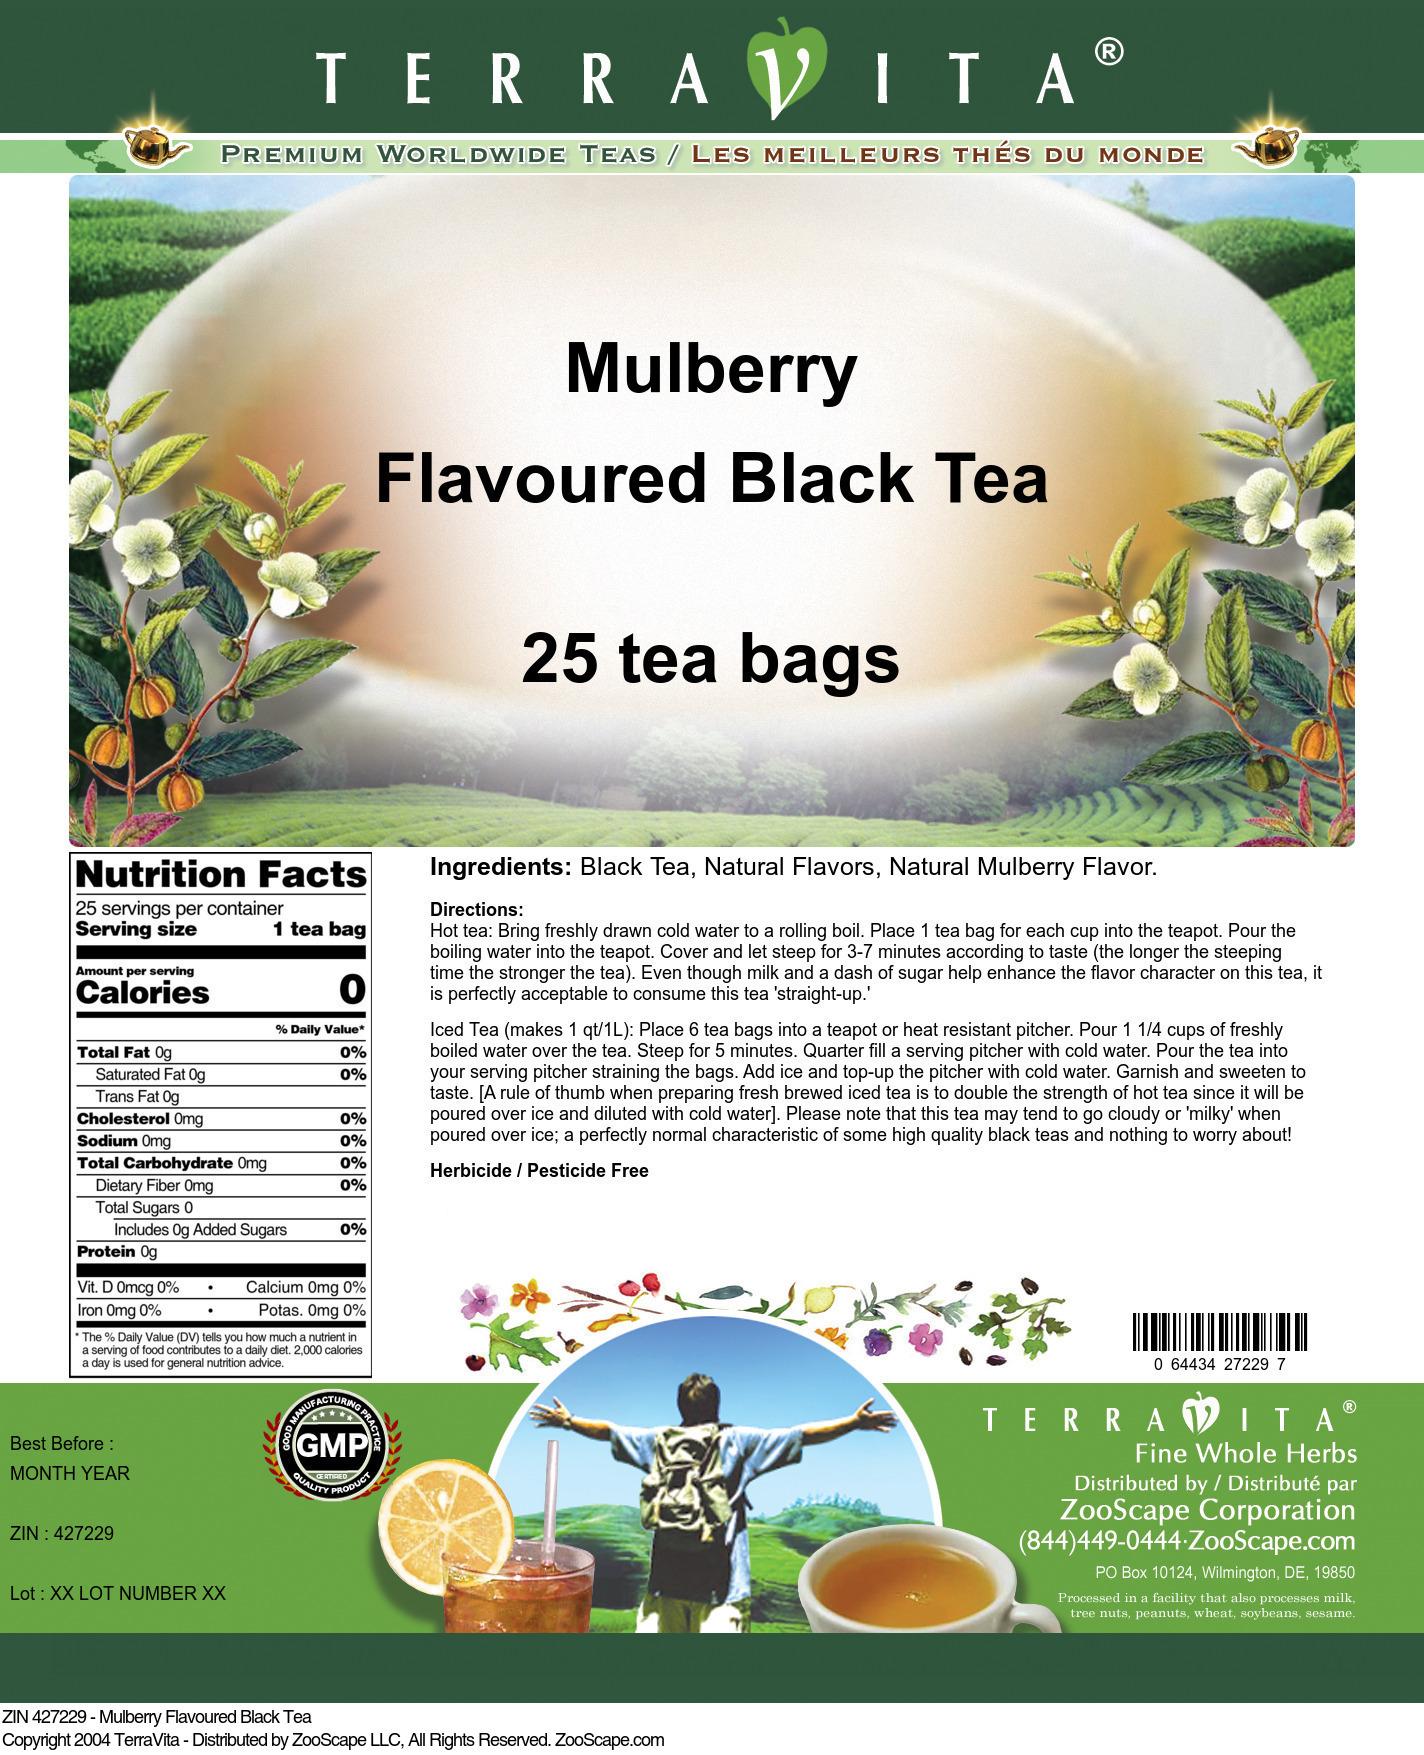 Mulberry Flavoured Black Tea